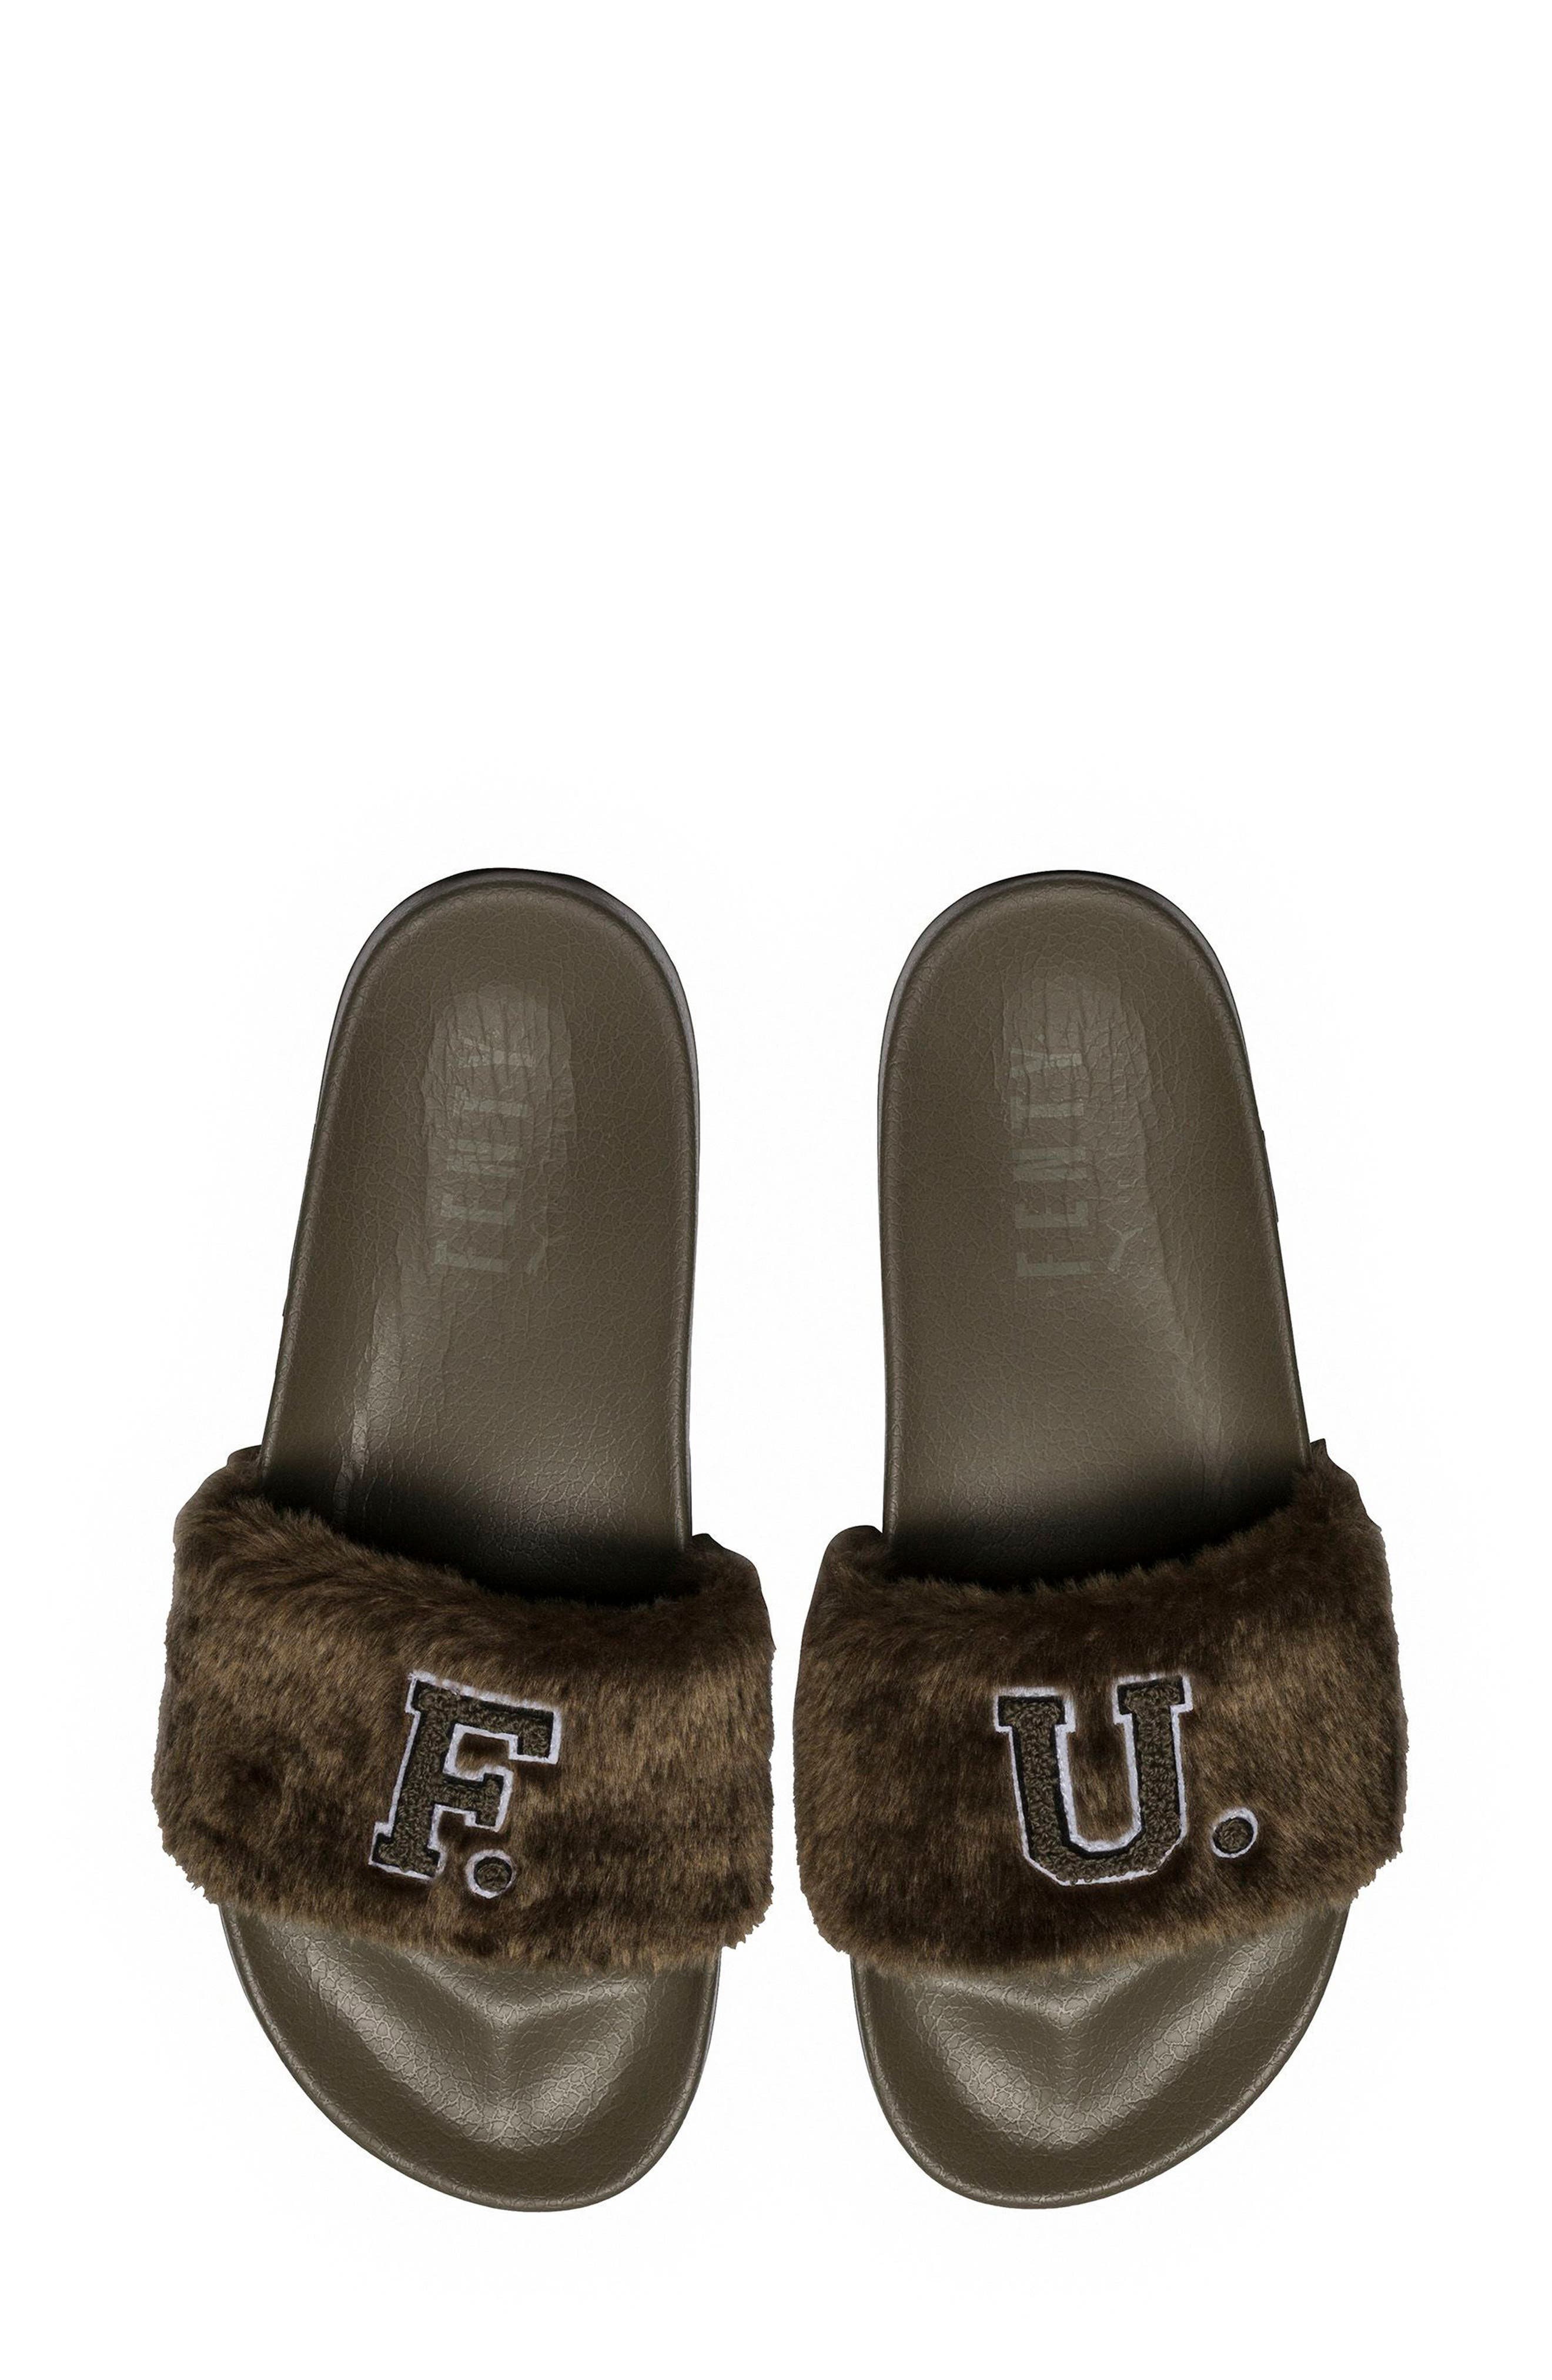 FENTY PUMA by Rihanna Lead Cat Slide Sandals,                         Main,                         color, Burnt Olive - Puma Black